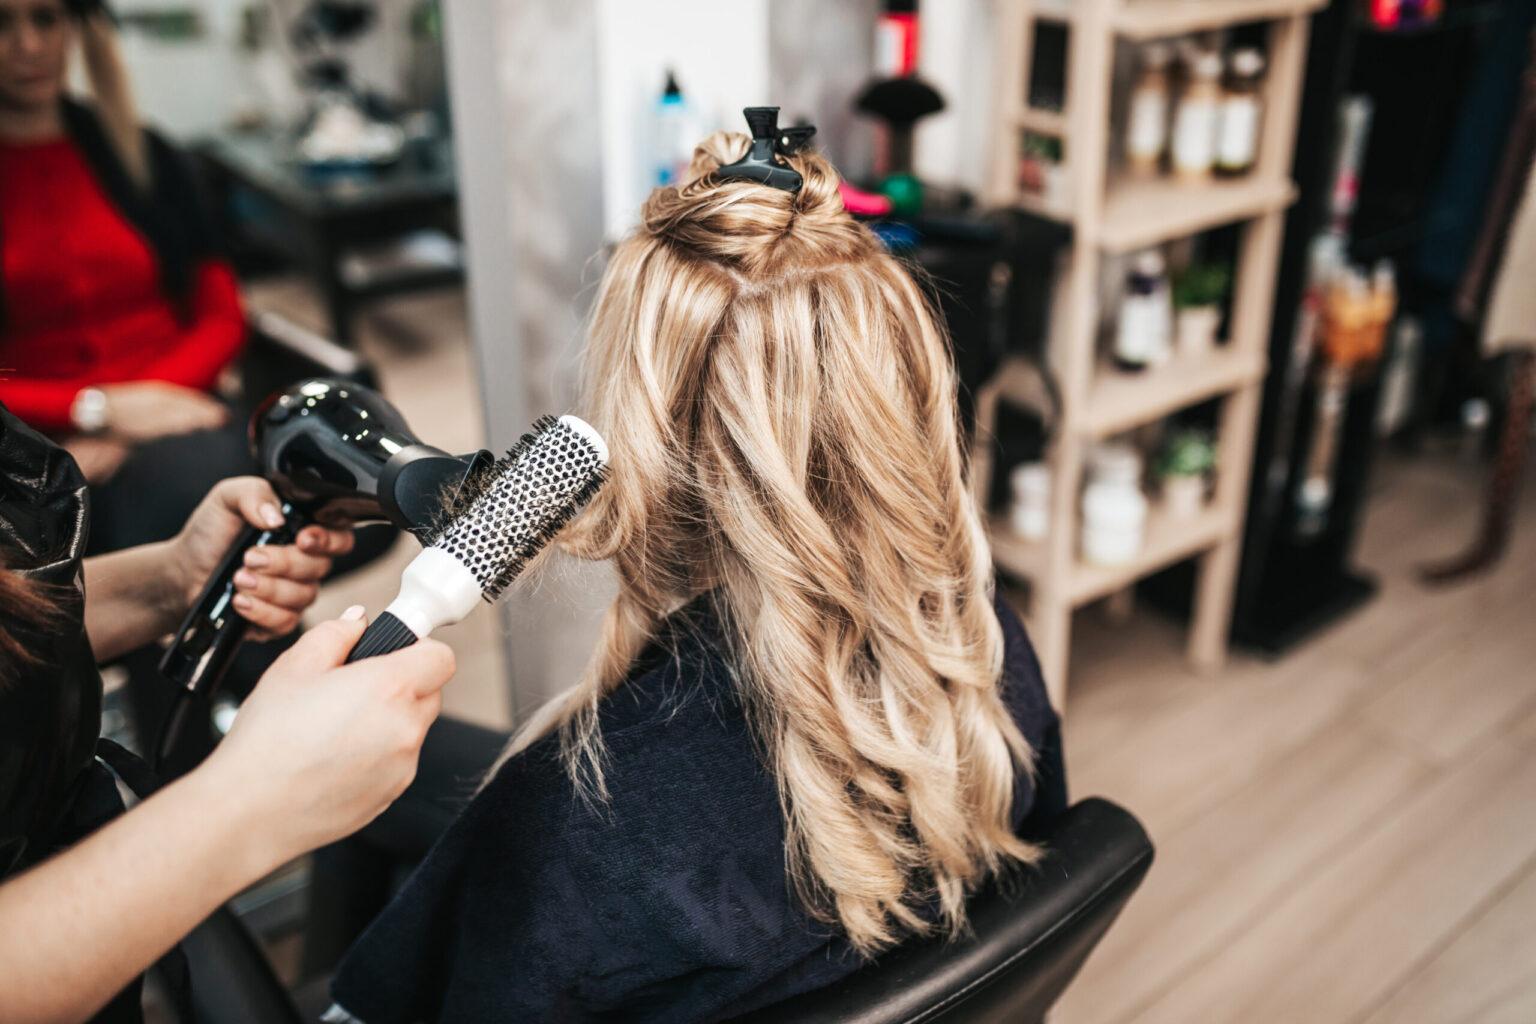 Curling long hair